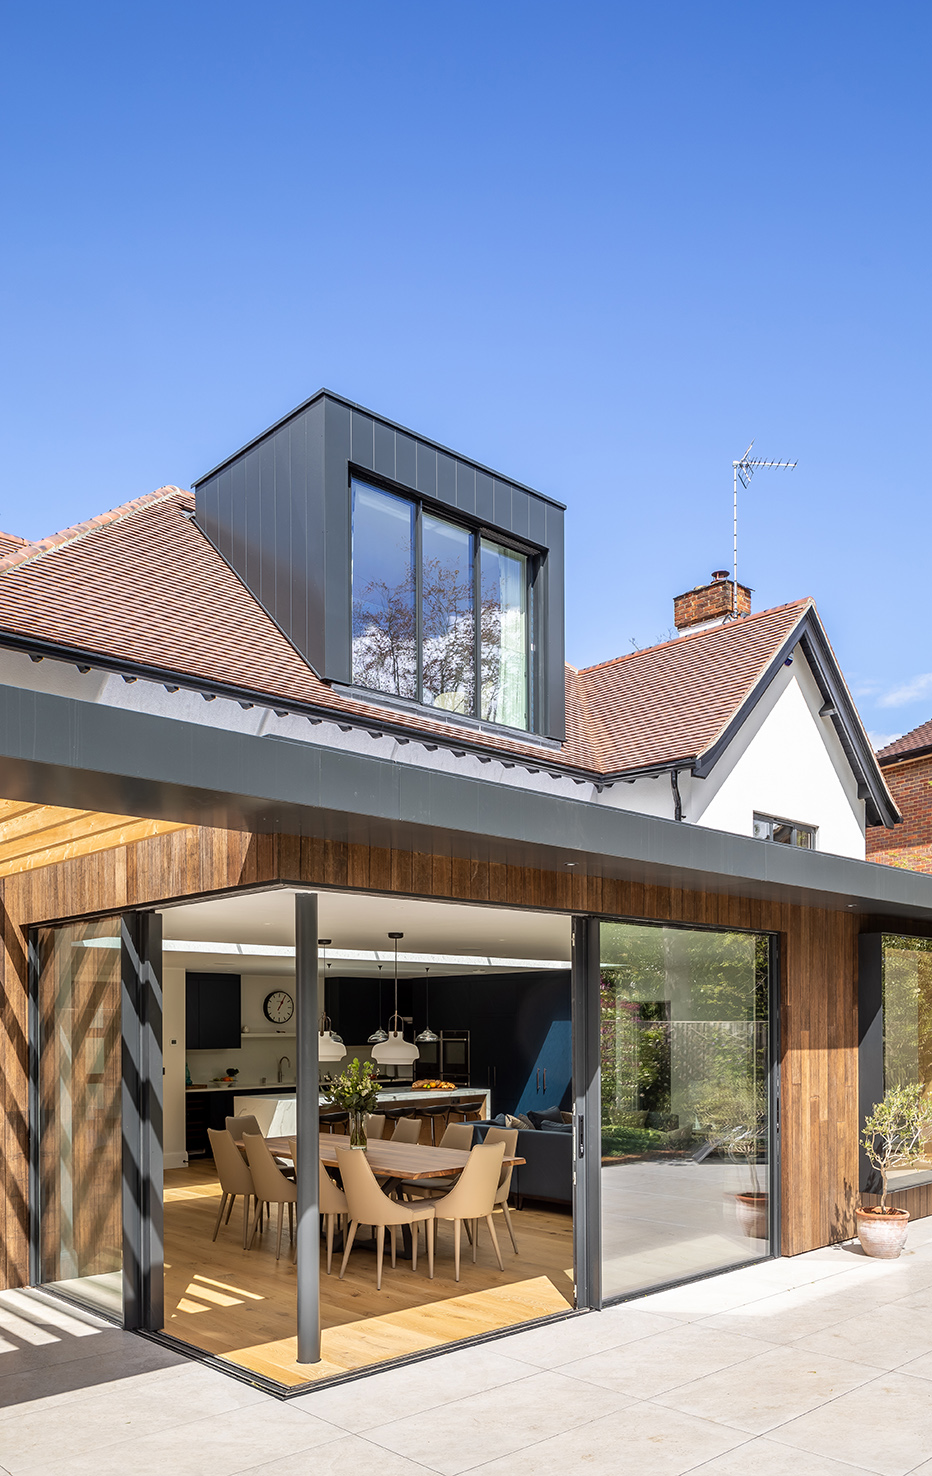 Chilterns-Hill-SL320-Rooflight-Fixed-Window_7